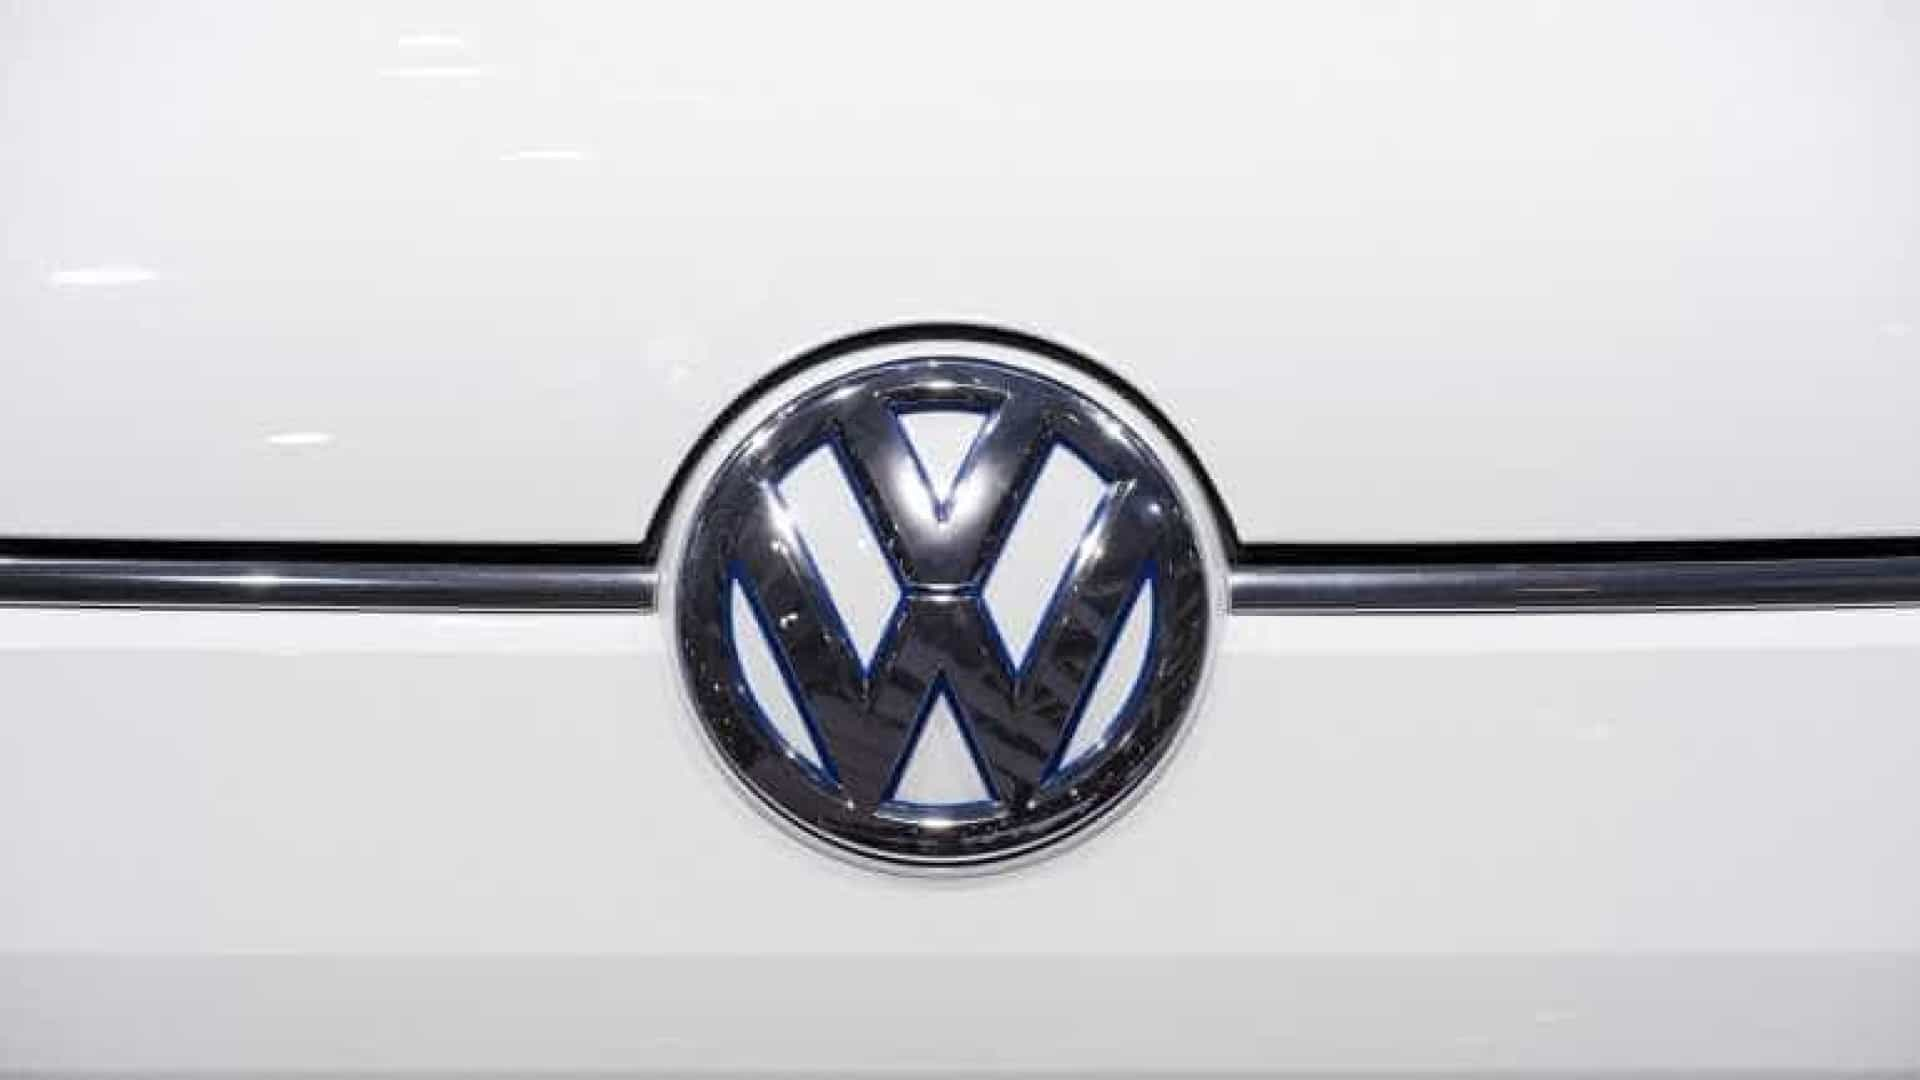 Recall de veículos Volkswagen começa nesta terça